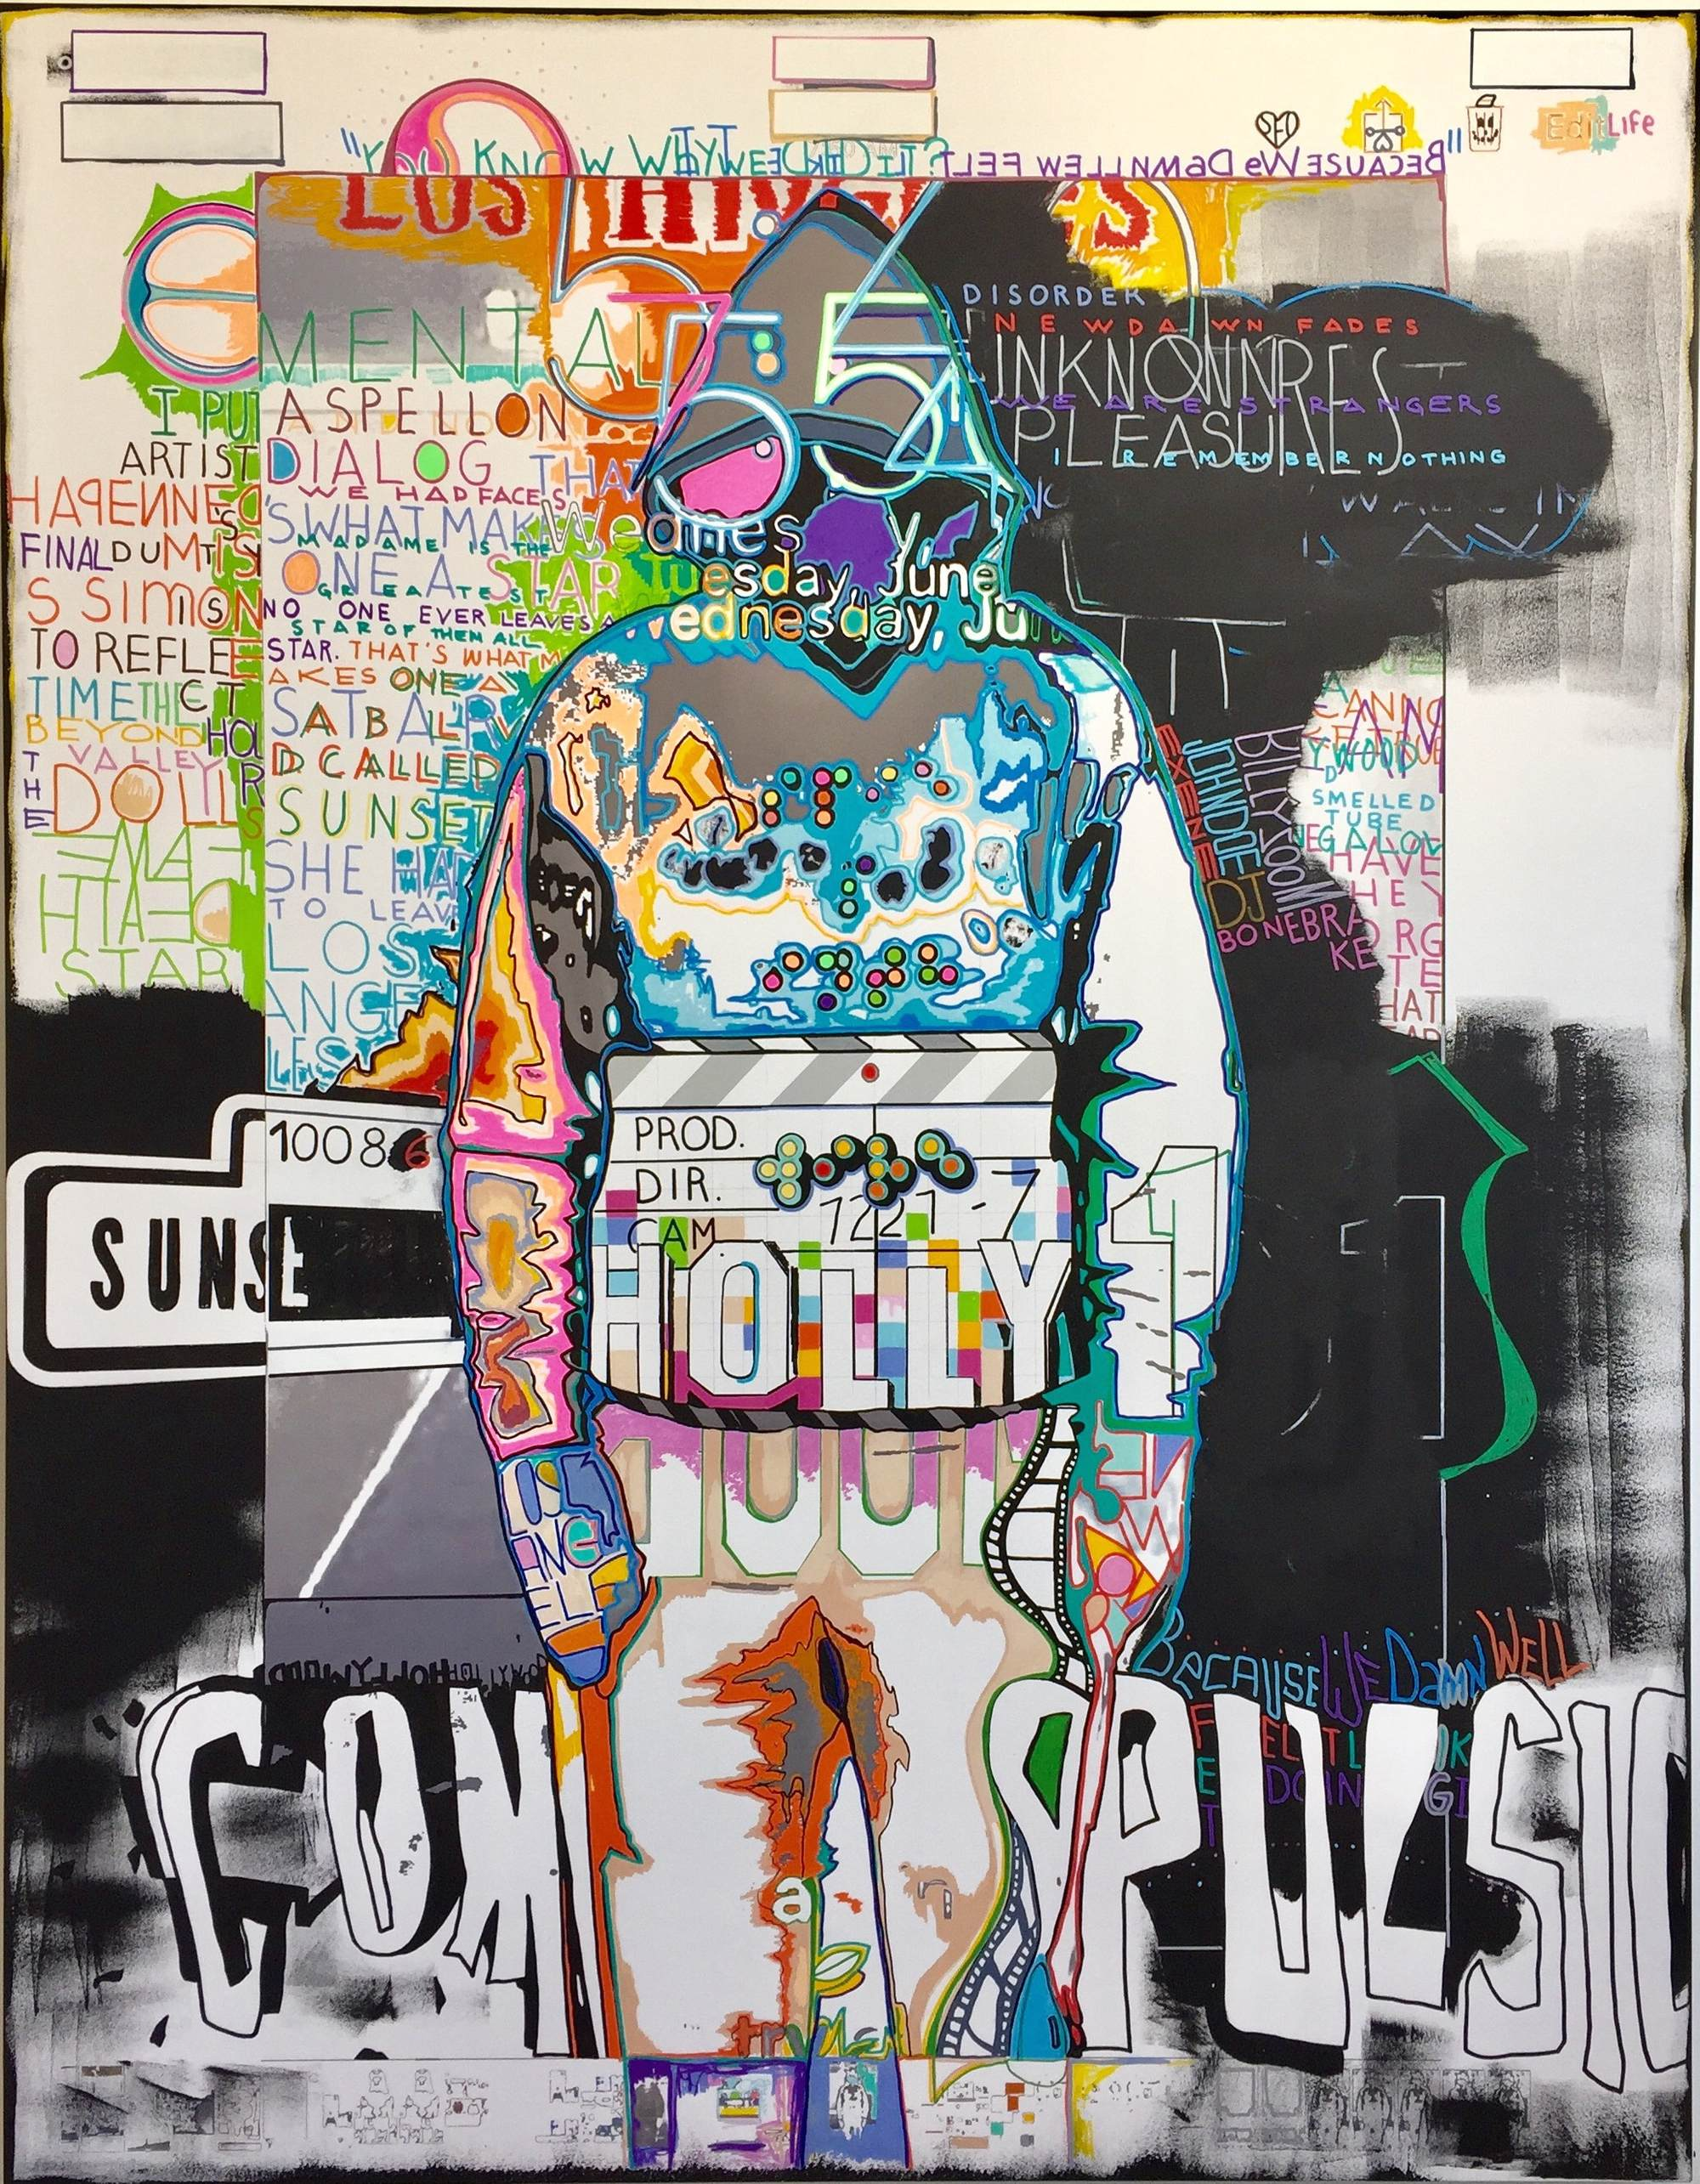 Physical Graffiti: Compulsion, 2017